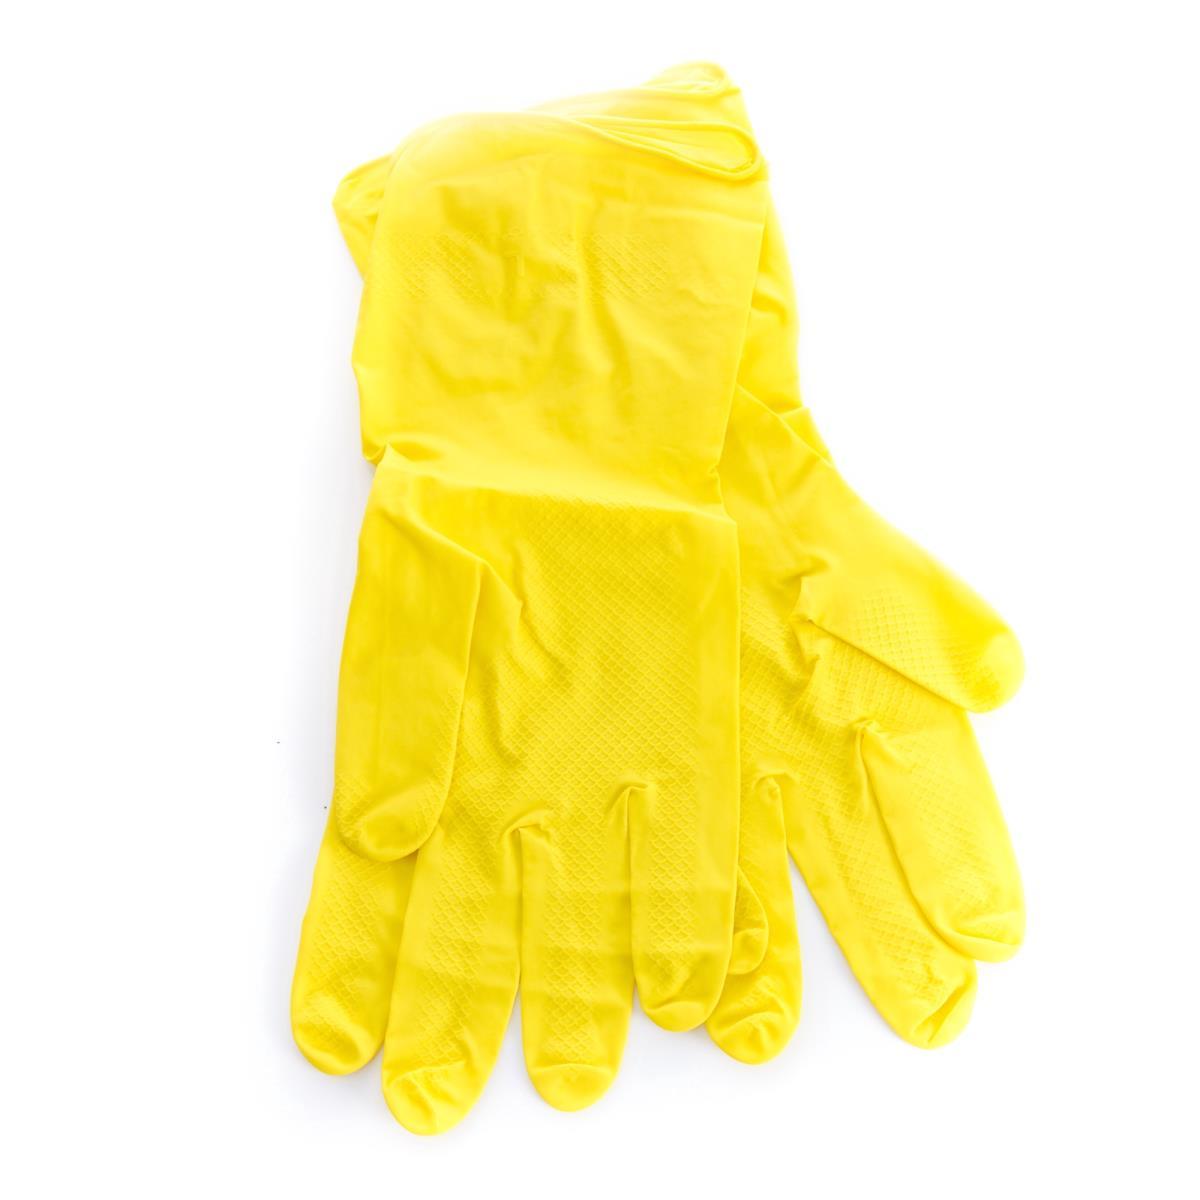 1 Paar Latex Handschuhe Gelb Haushaltshandschuhe Putzhandschuhe Handschuhe Gr.L,Okko,GL41, 4772013082132